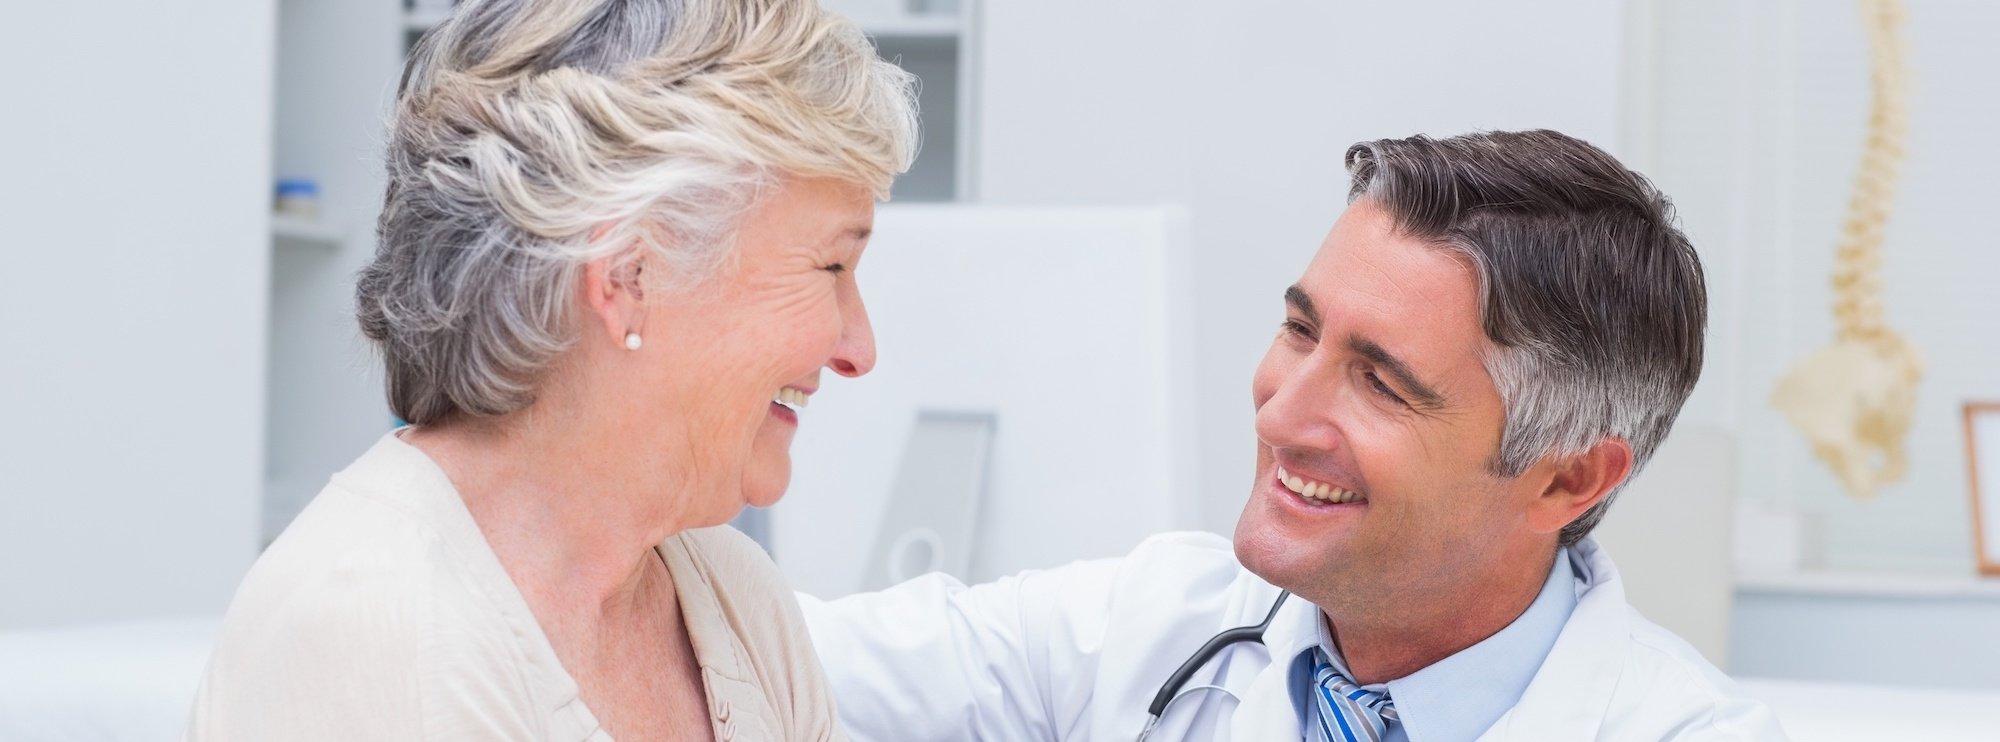 Closing Gaps in Care